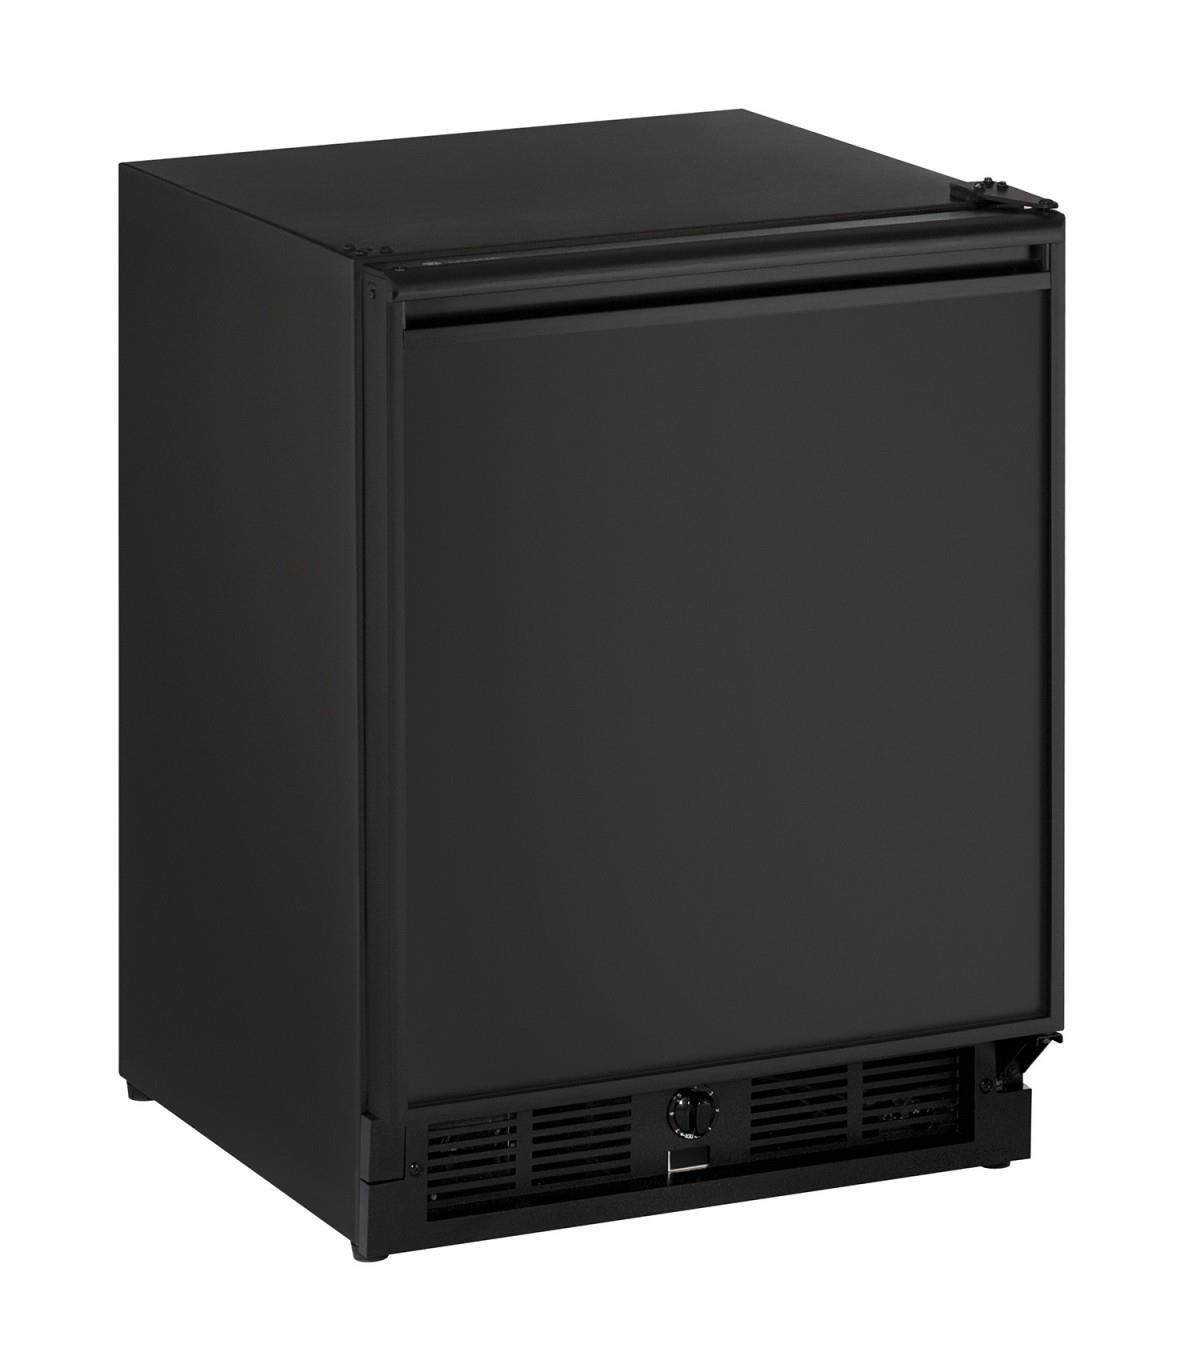 "U-Line Refrigerators 3.3 Cu. Ft. 18"" Compact All-Refrigerator - Item Number: U-29RB-00A"